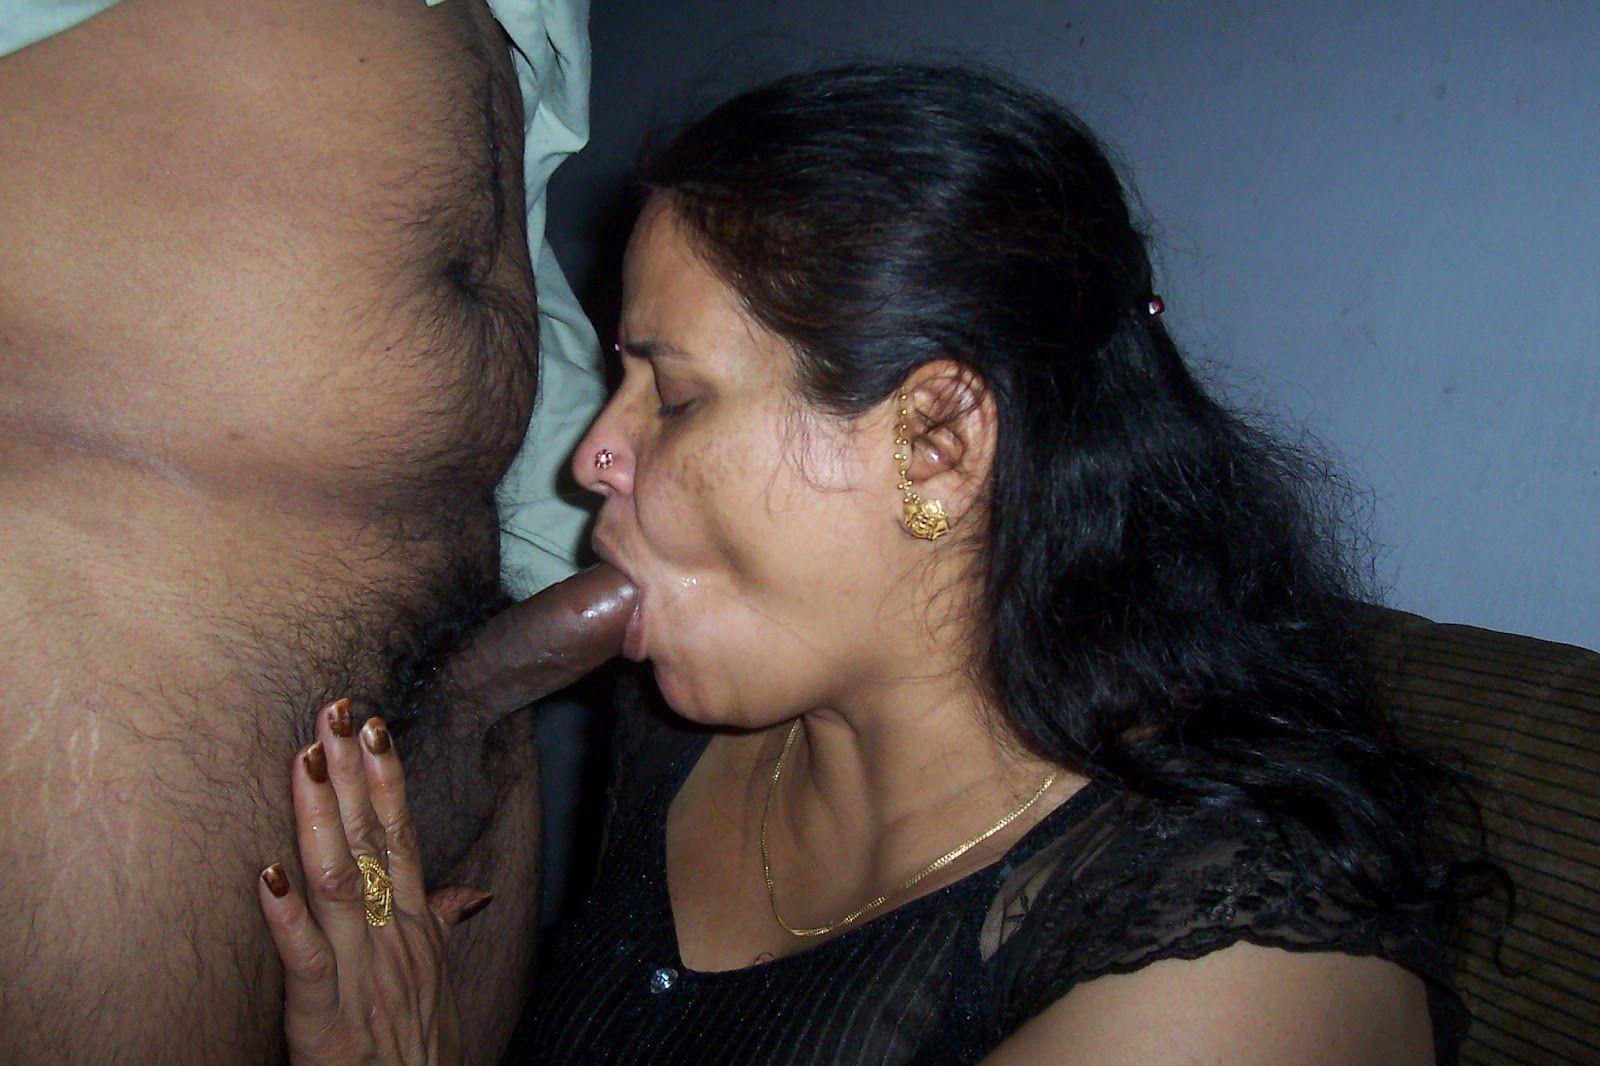 best of Indian blowjob Mature Gator string bikini. «